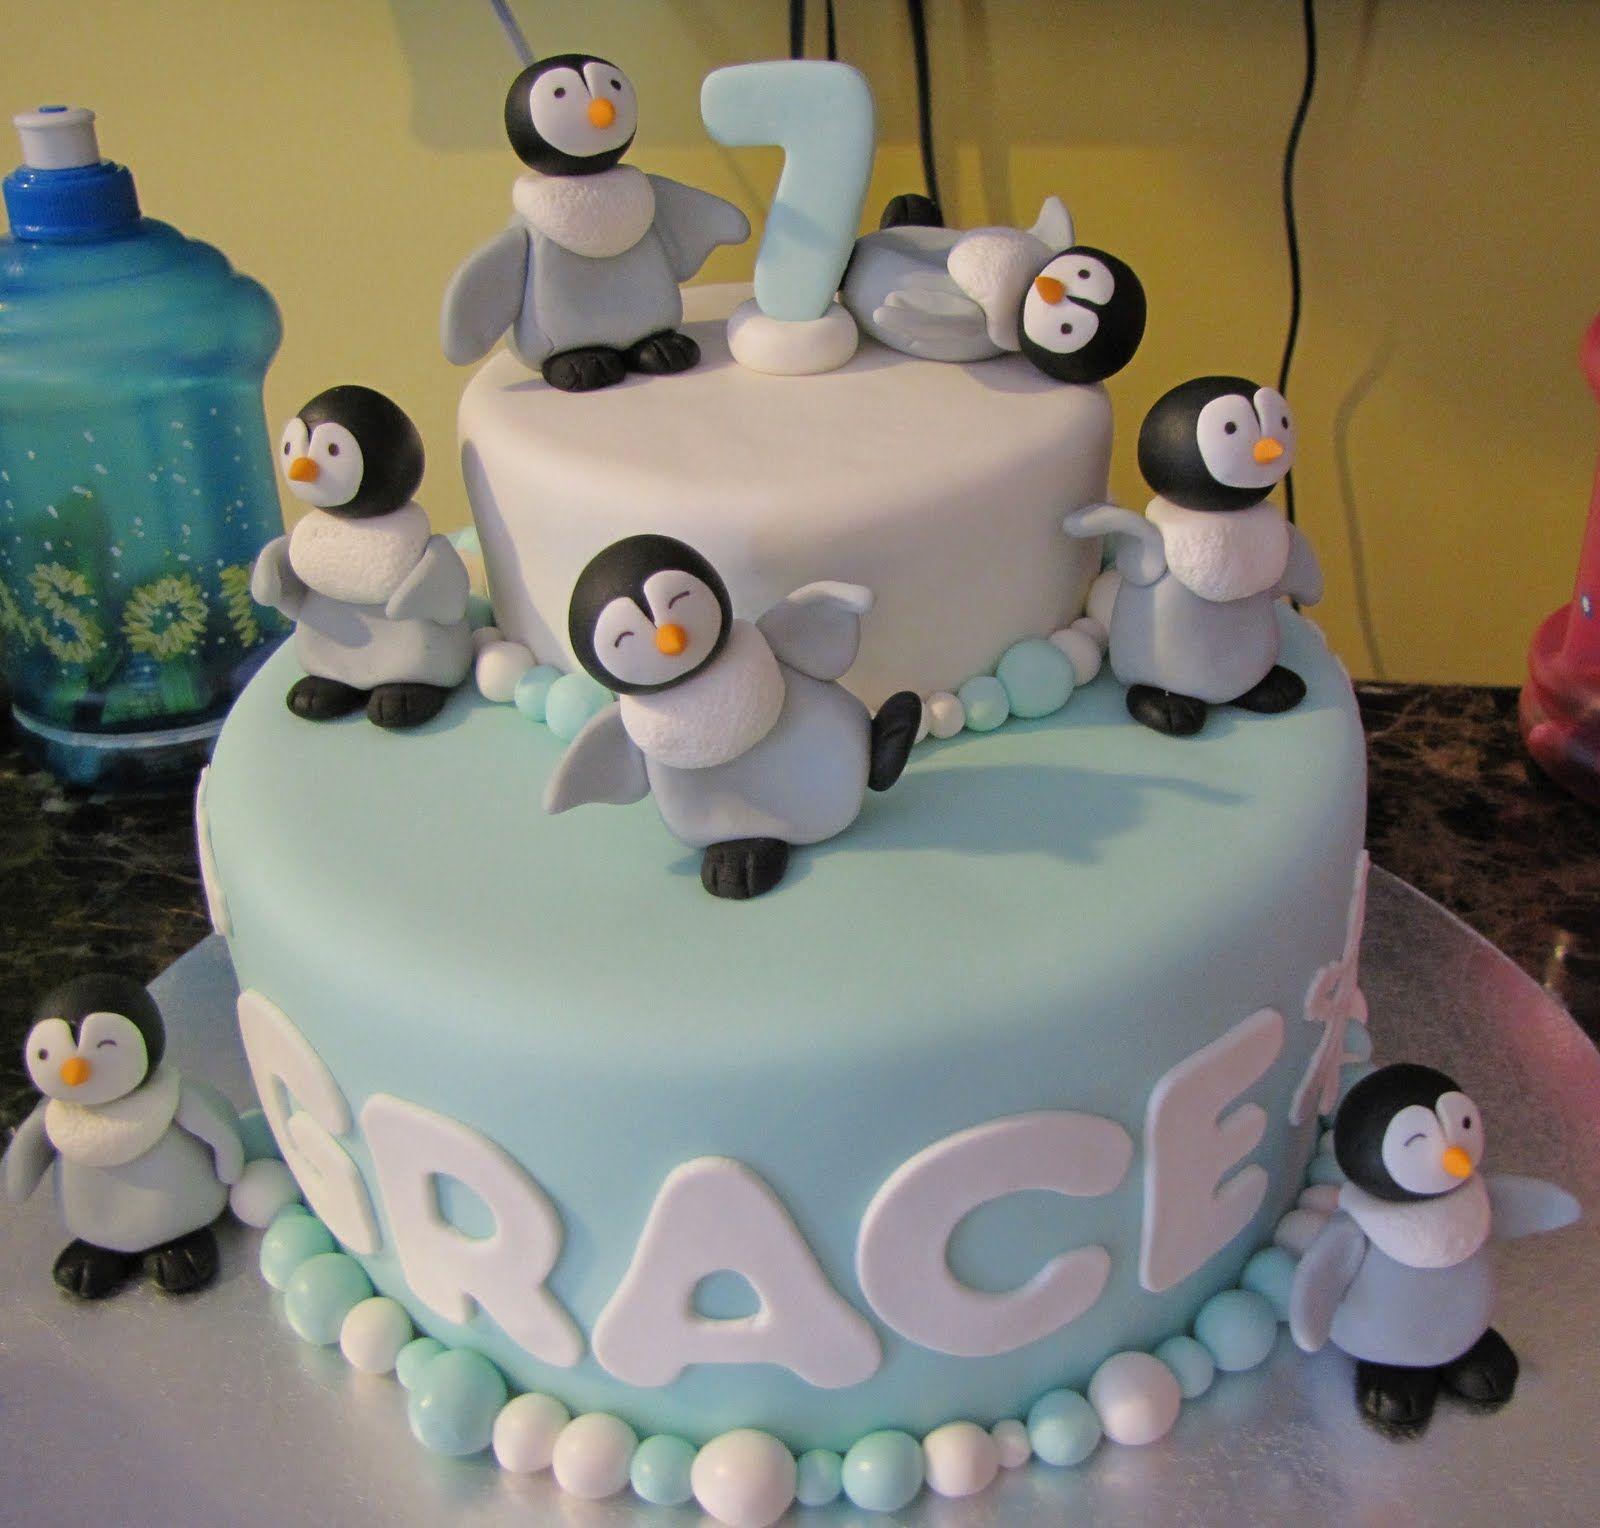 penguin birthday cakes   Birthday Cakes For You: Penguin cake